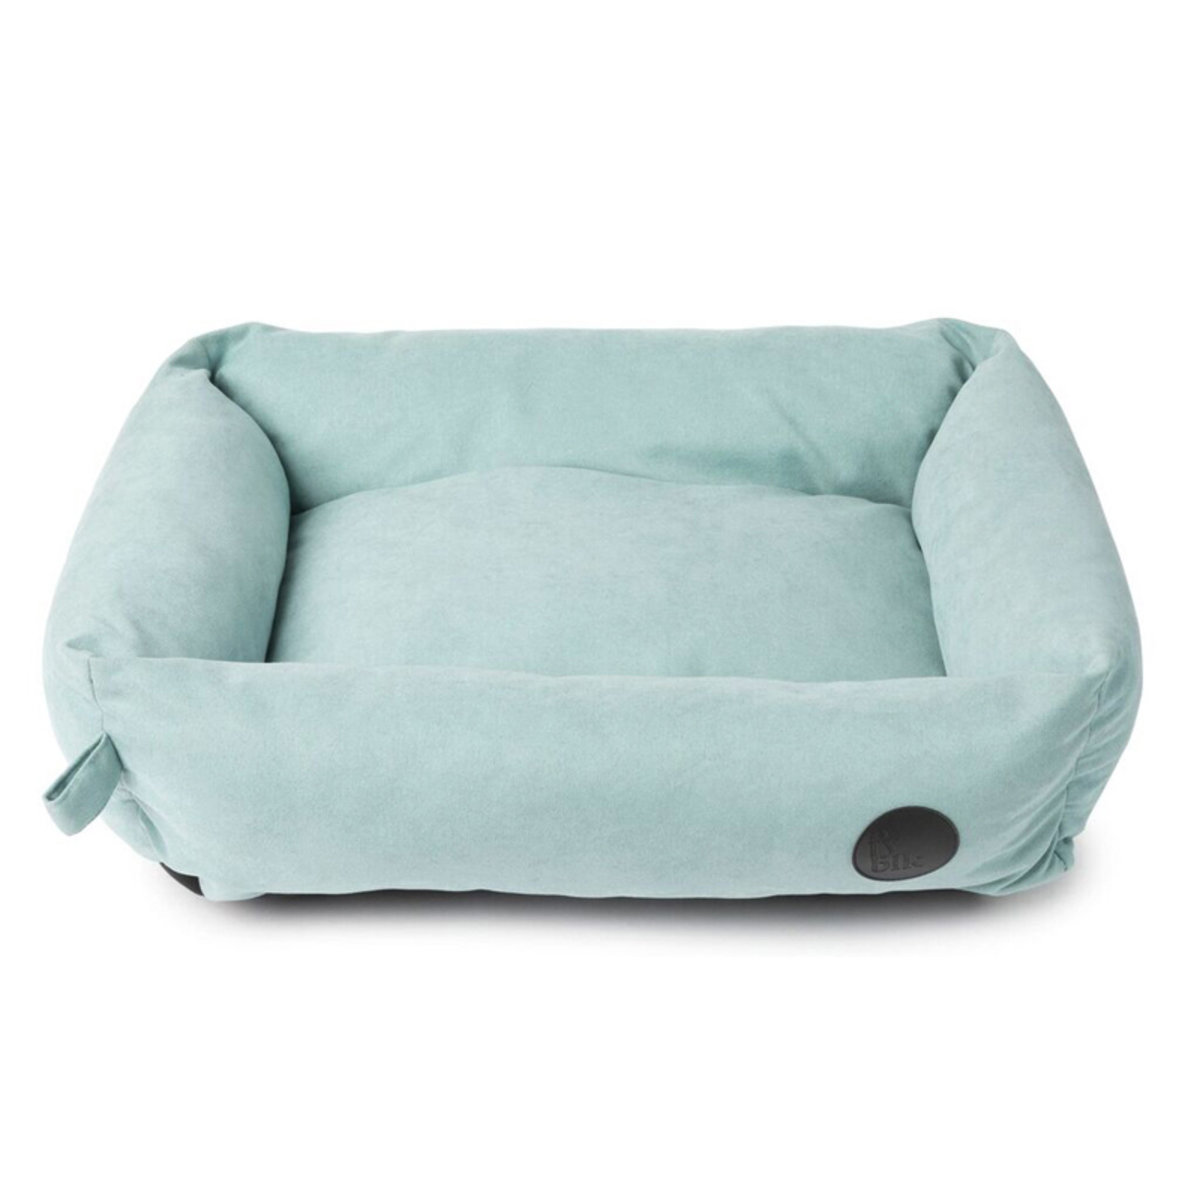 The Lounge Bed - Powder Blue Large K28